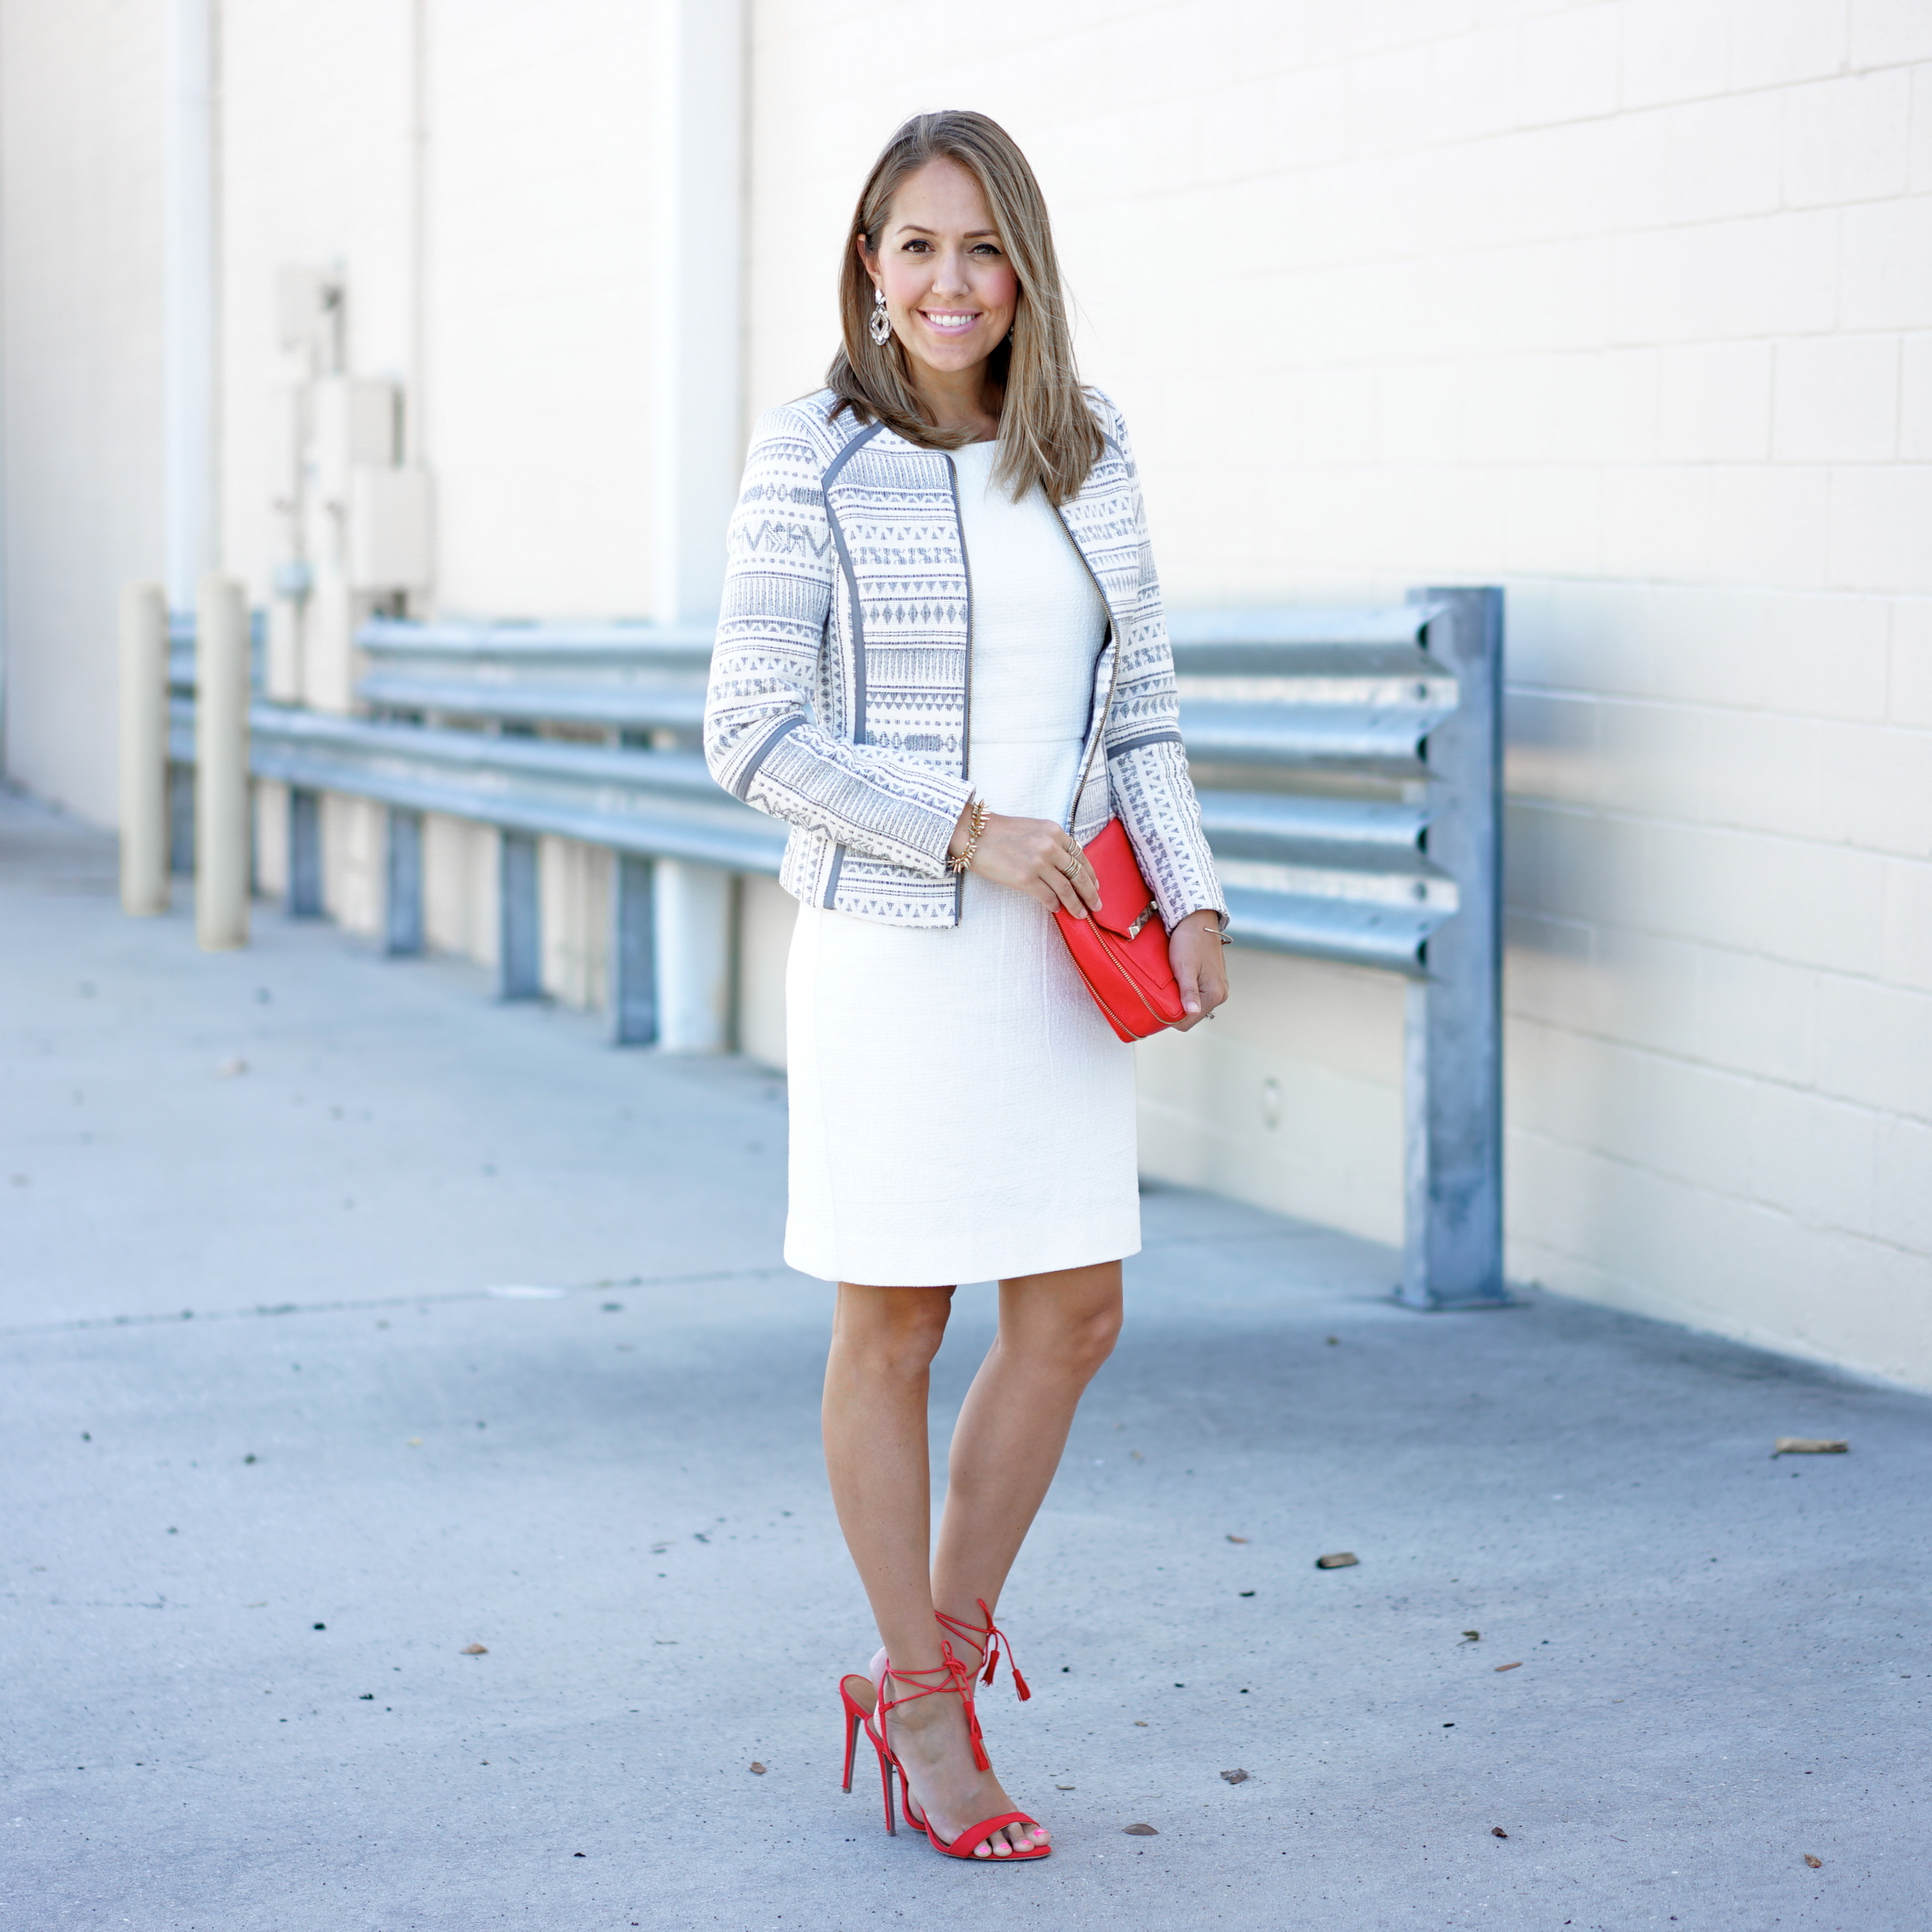 Patterned jacket, white dress, red heels